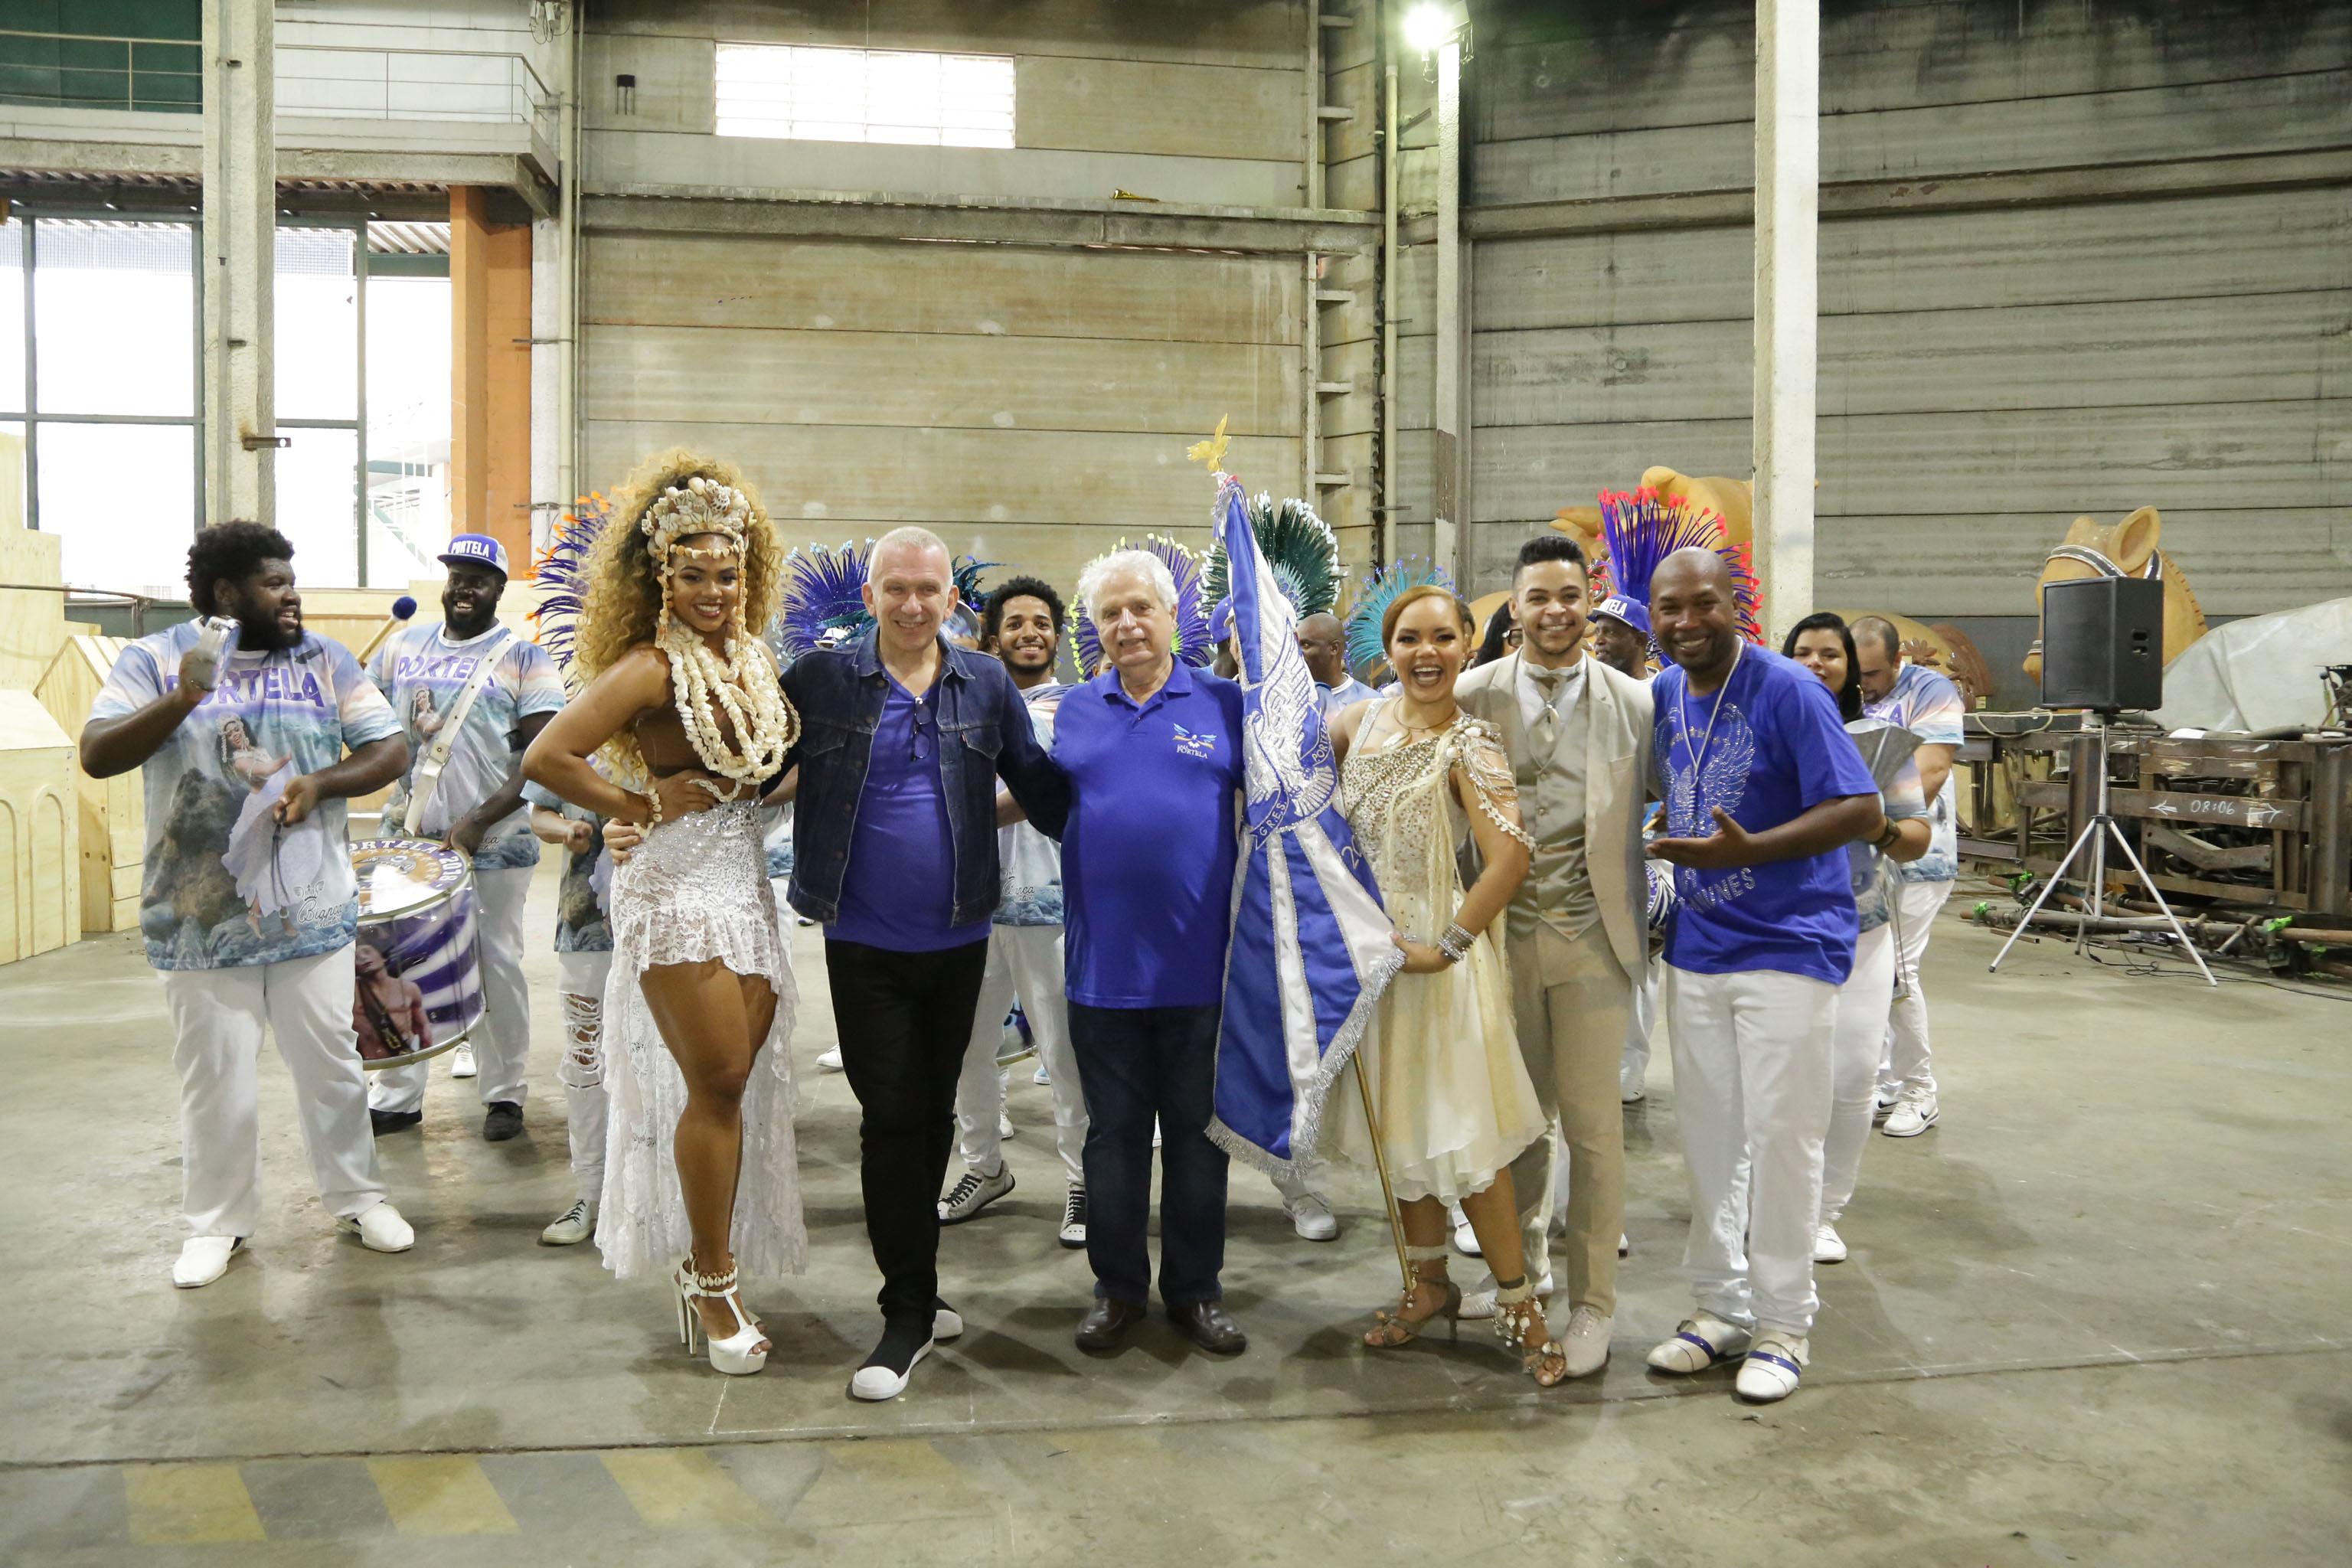 Jean Paul Gaultier Teams With Samba School for Rio Carnival